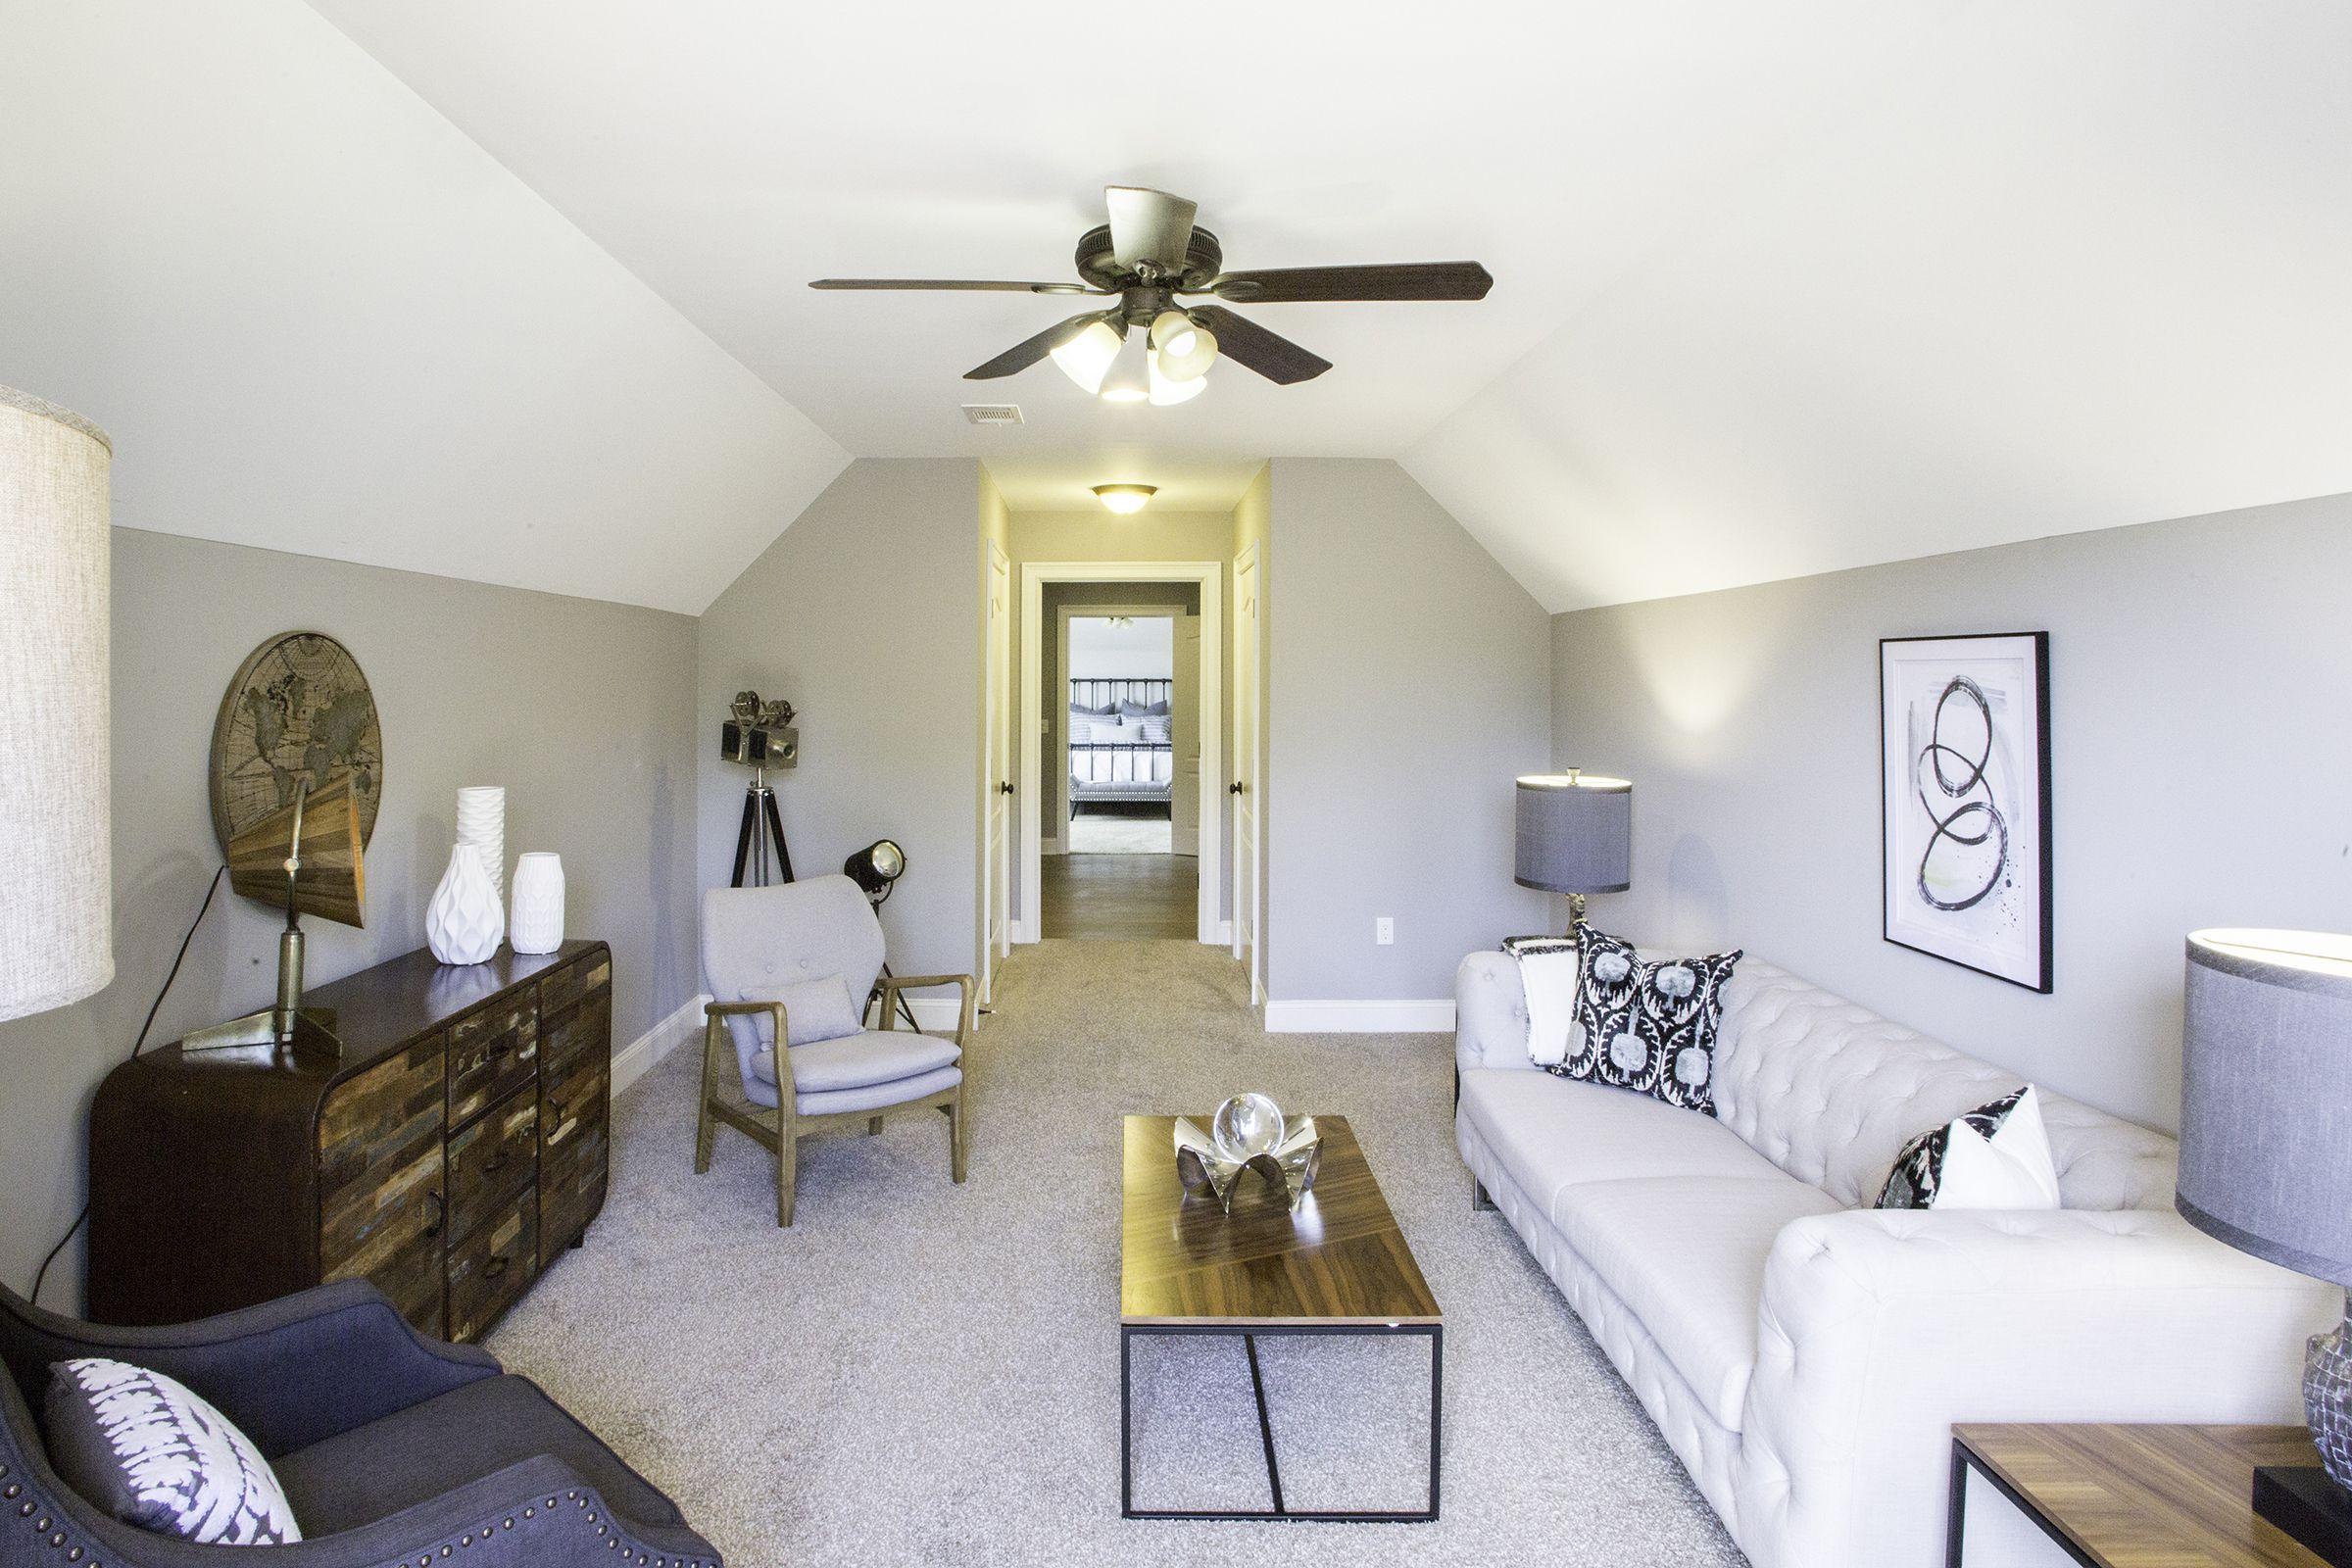 Bonus room staging by Blairhaus Interiors & Home Staging